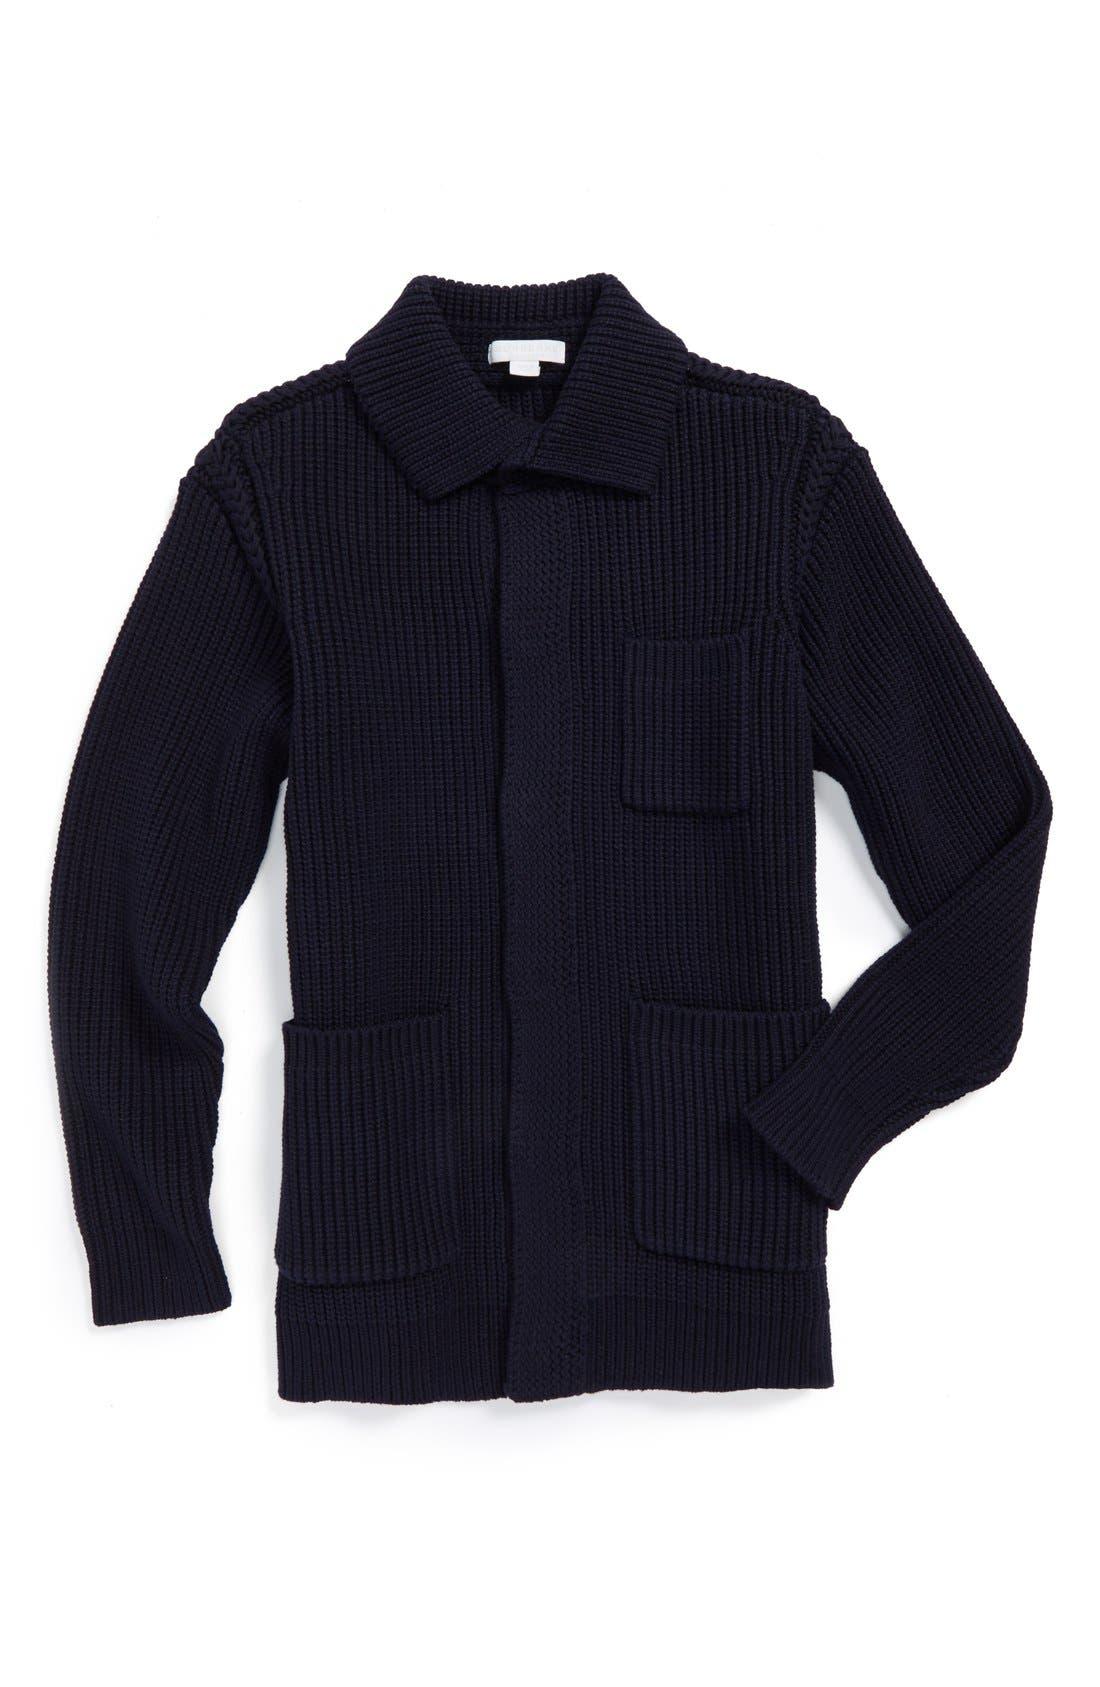 Alternate Image 1 Selected - Burberry Knit Cardigan (Little Boys & Big Boys)